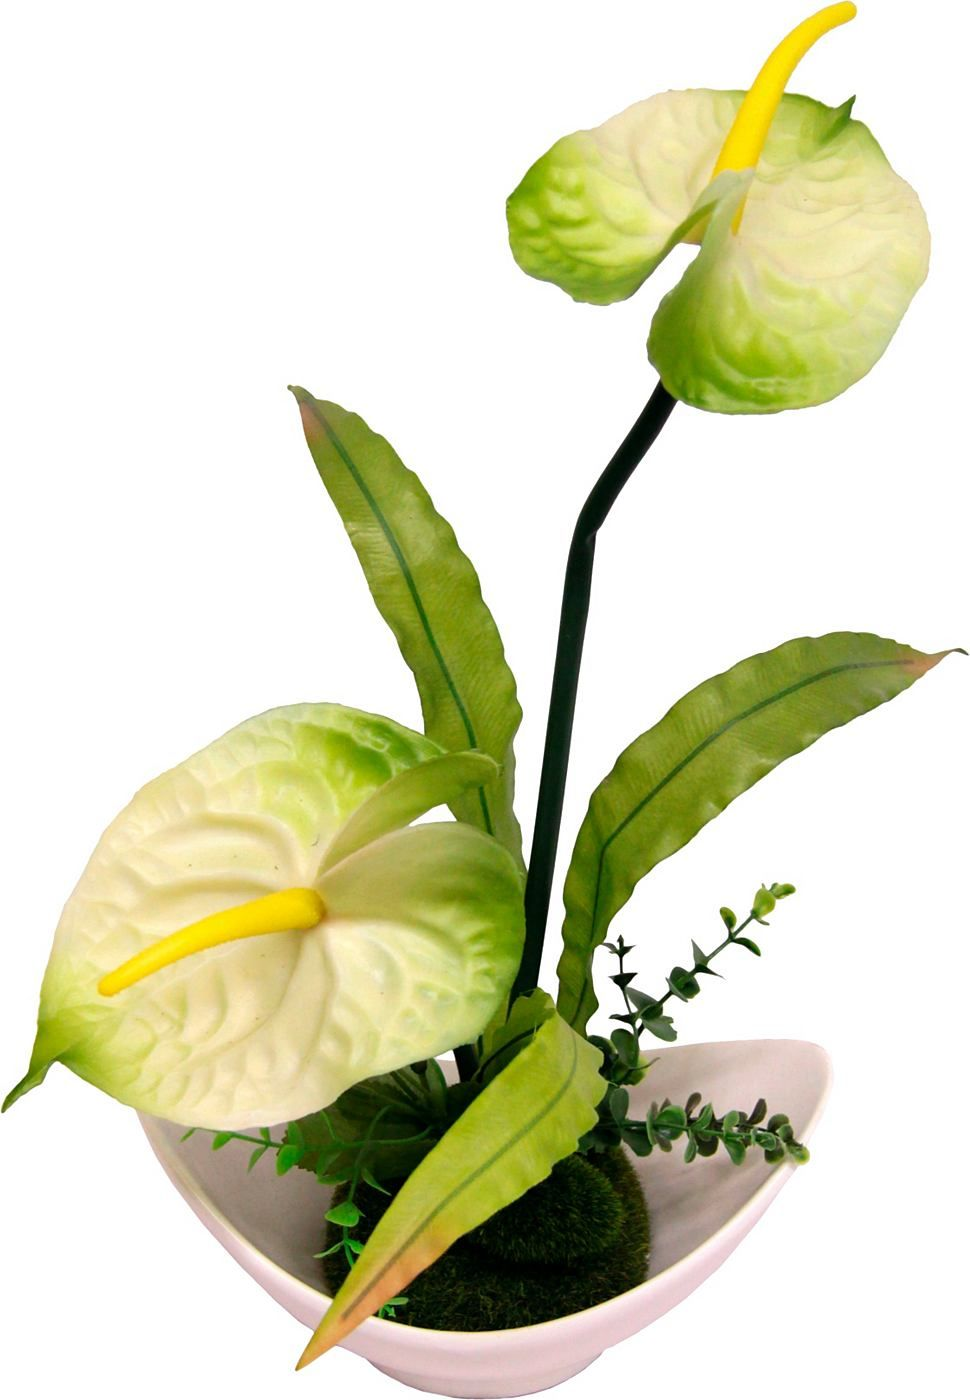 Artikeldetails:  Dekorative Kunstblume, Naturgetreu gearbeitet,  Maße:  Maße (B/T/H): 25/14/39 cm,  Material/Qualität:  Polyester, Kunststoff, Keramik,  ...